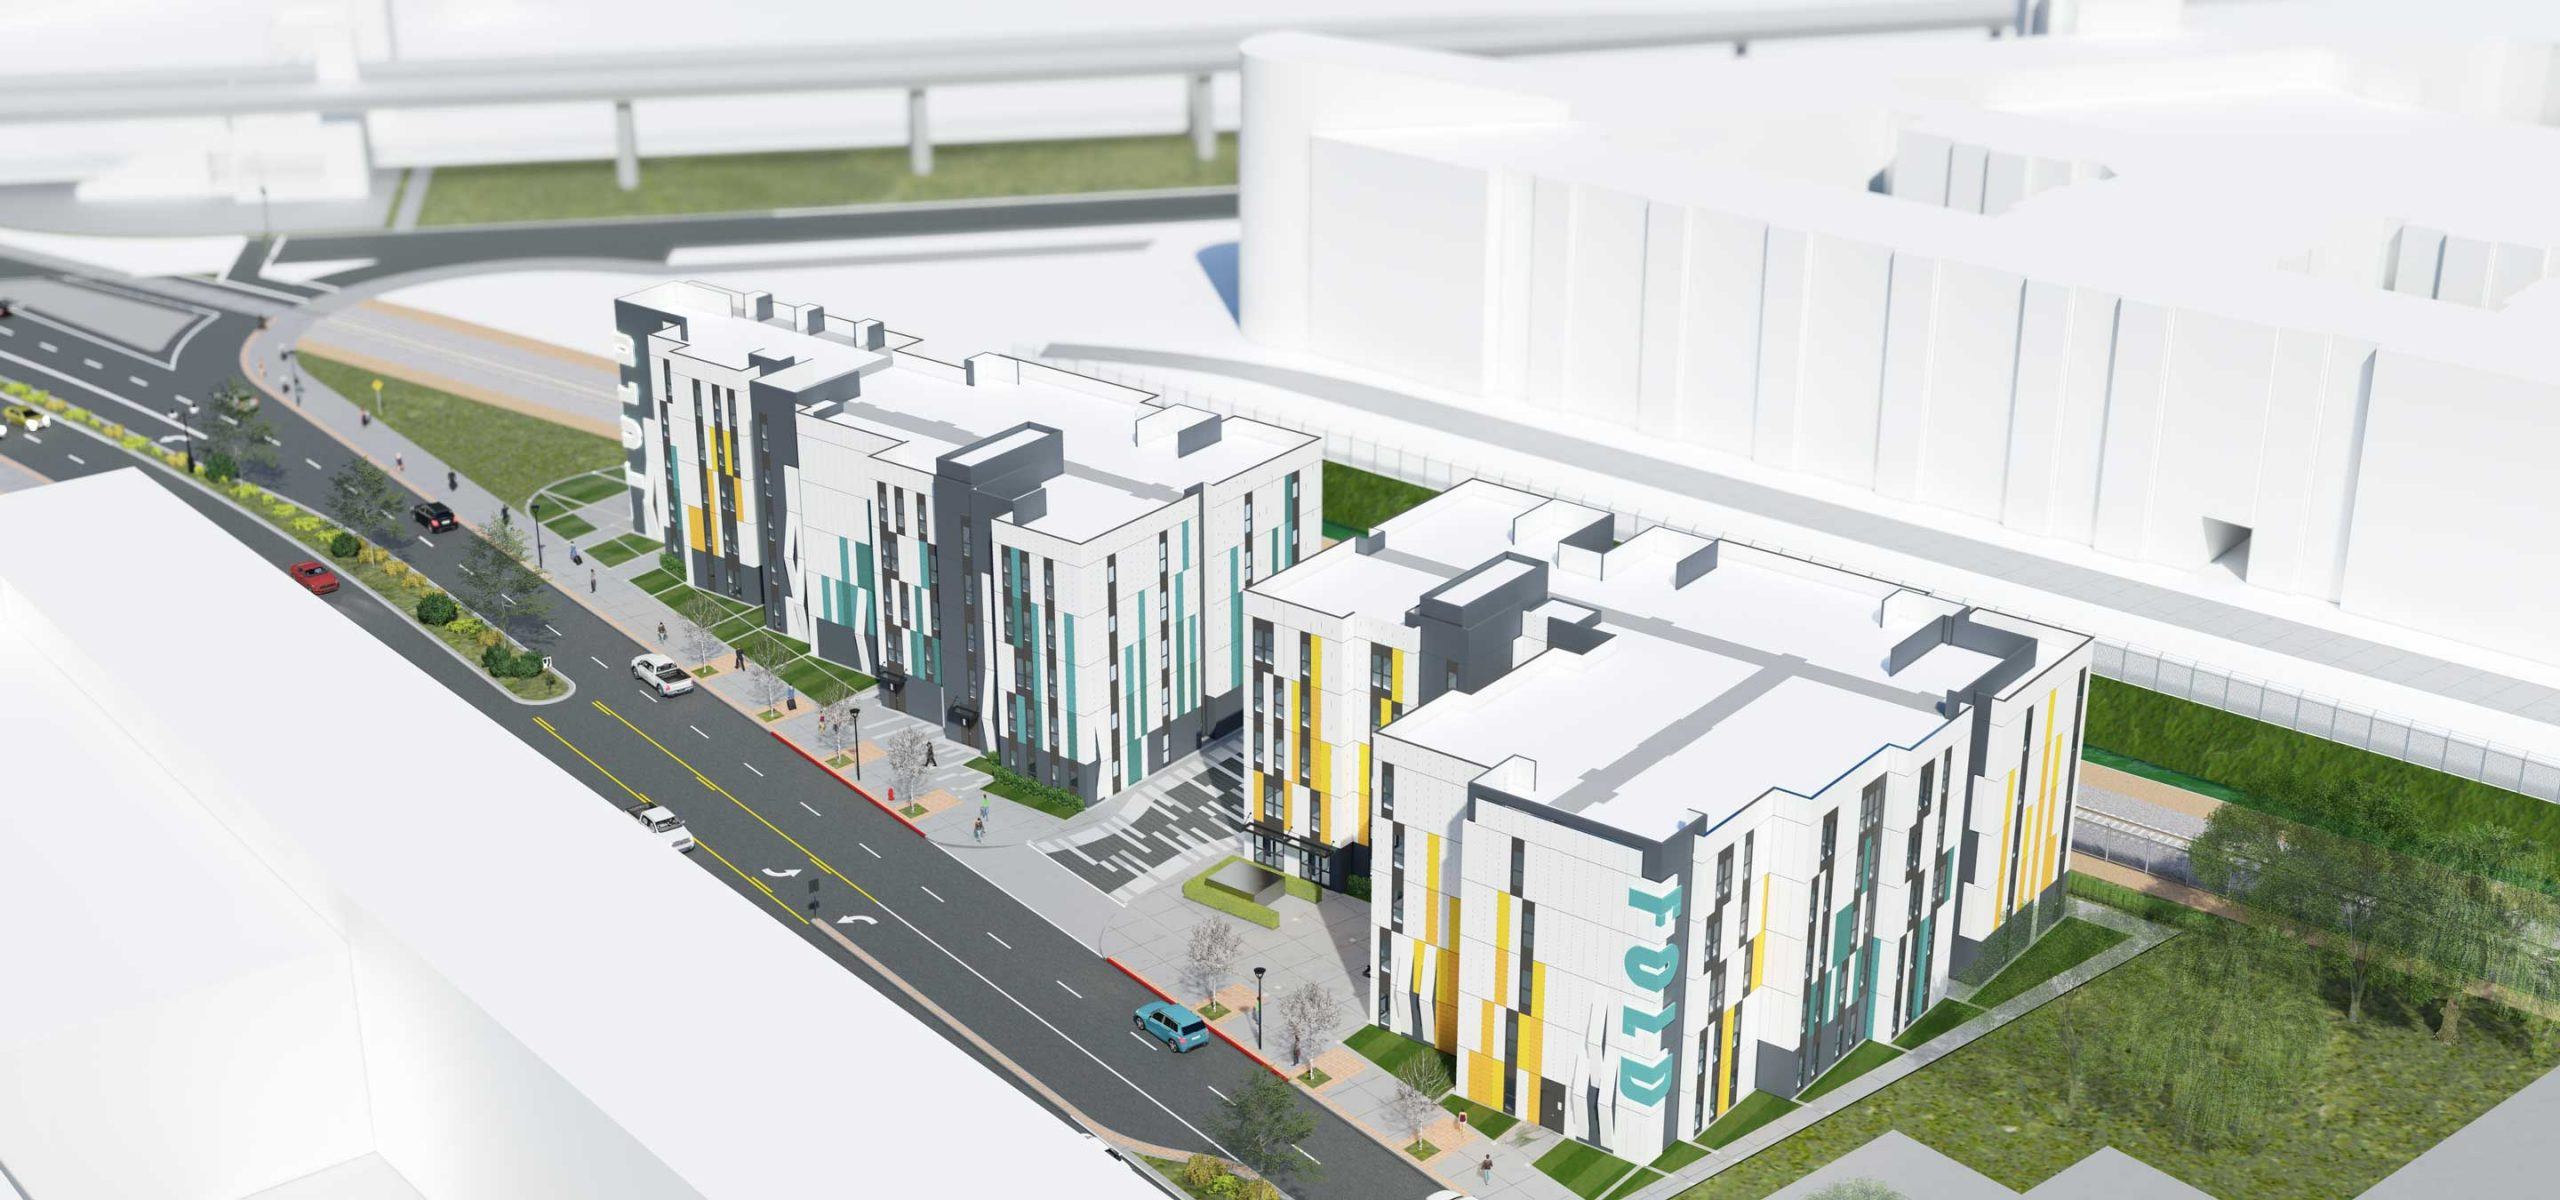 Aerial rendering of 5-story modular apartments